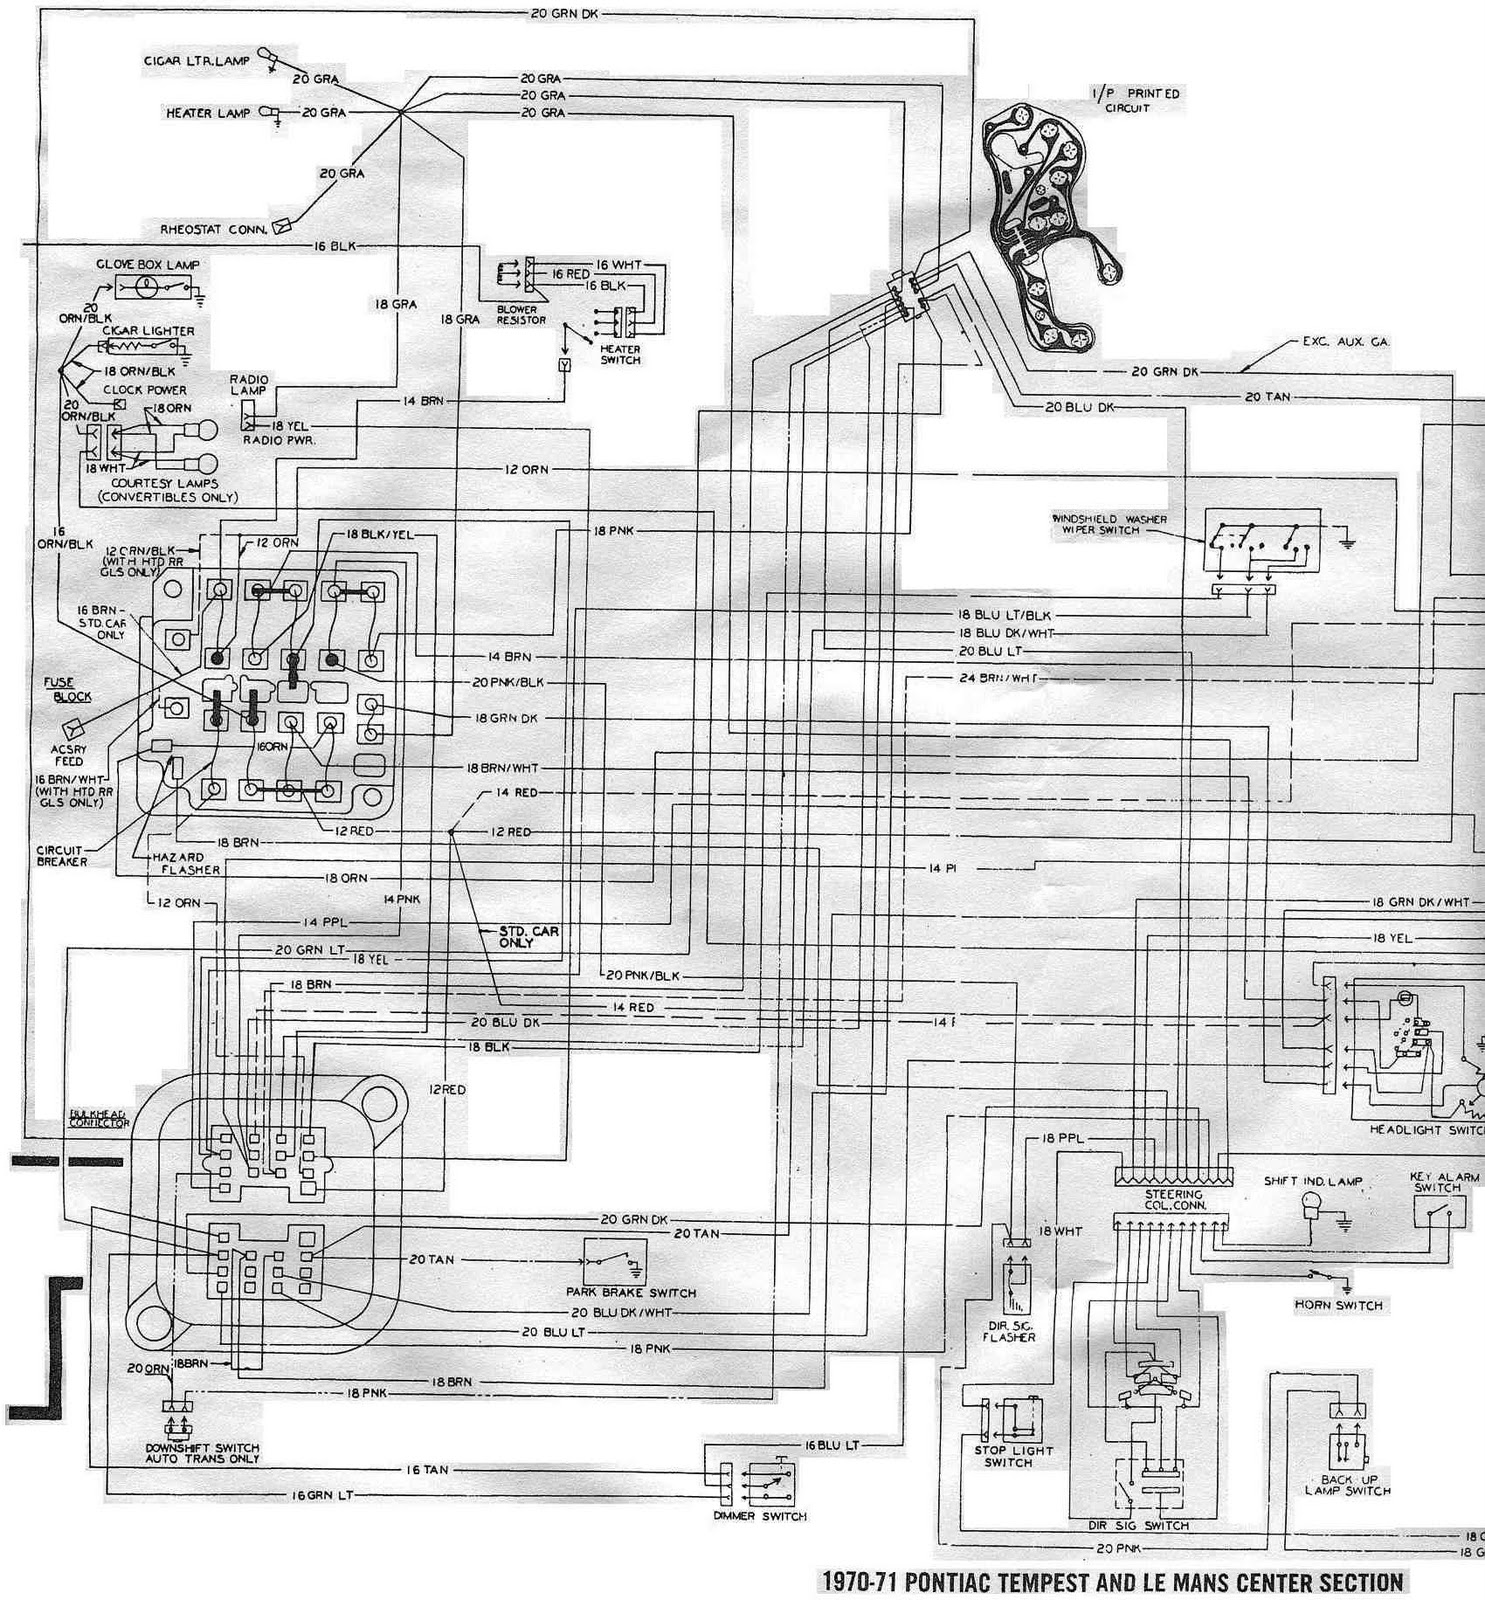 1969 Pontiac Gto Wiring Diagram Crown Oil Pressure Gauge 66 Layout 1967  Creativeand Co